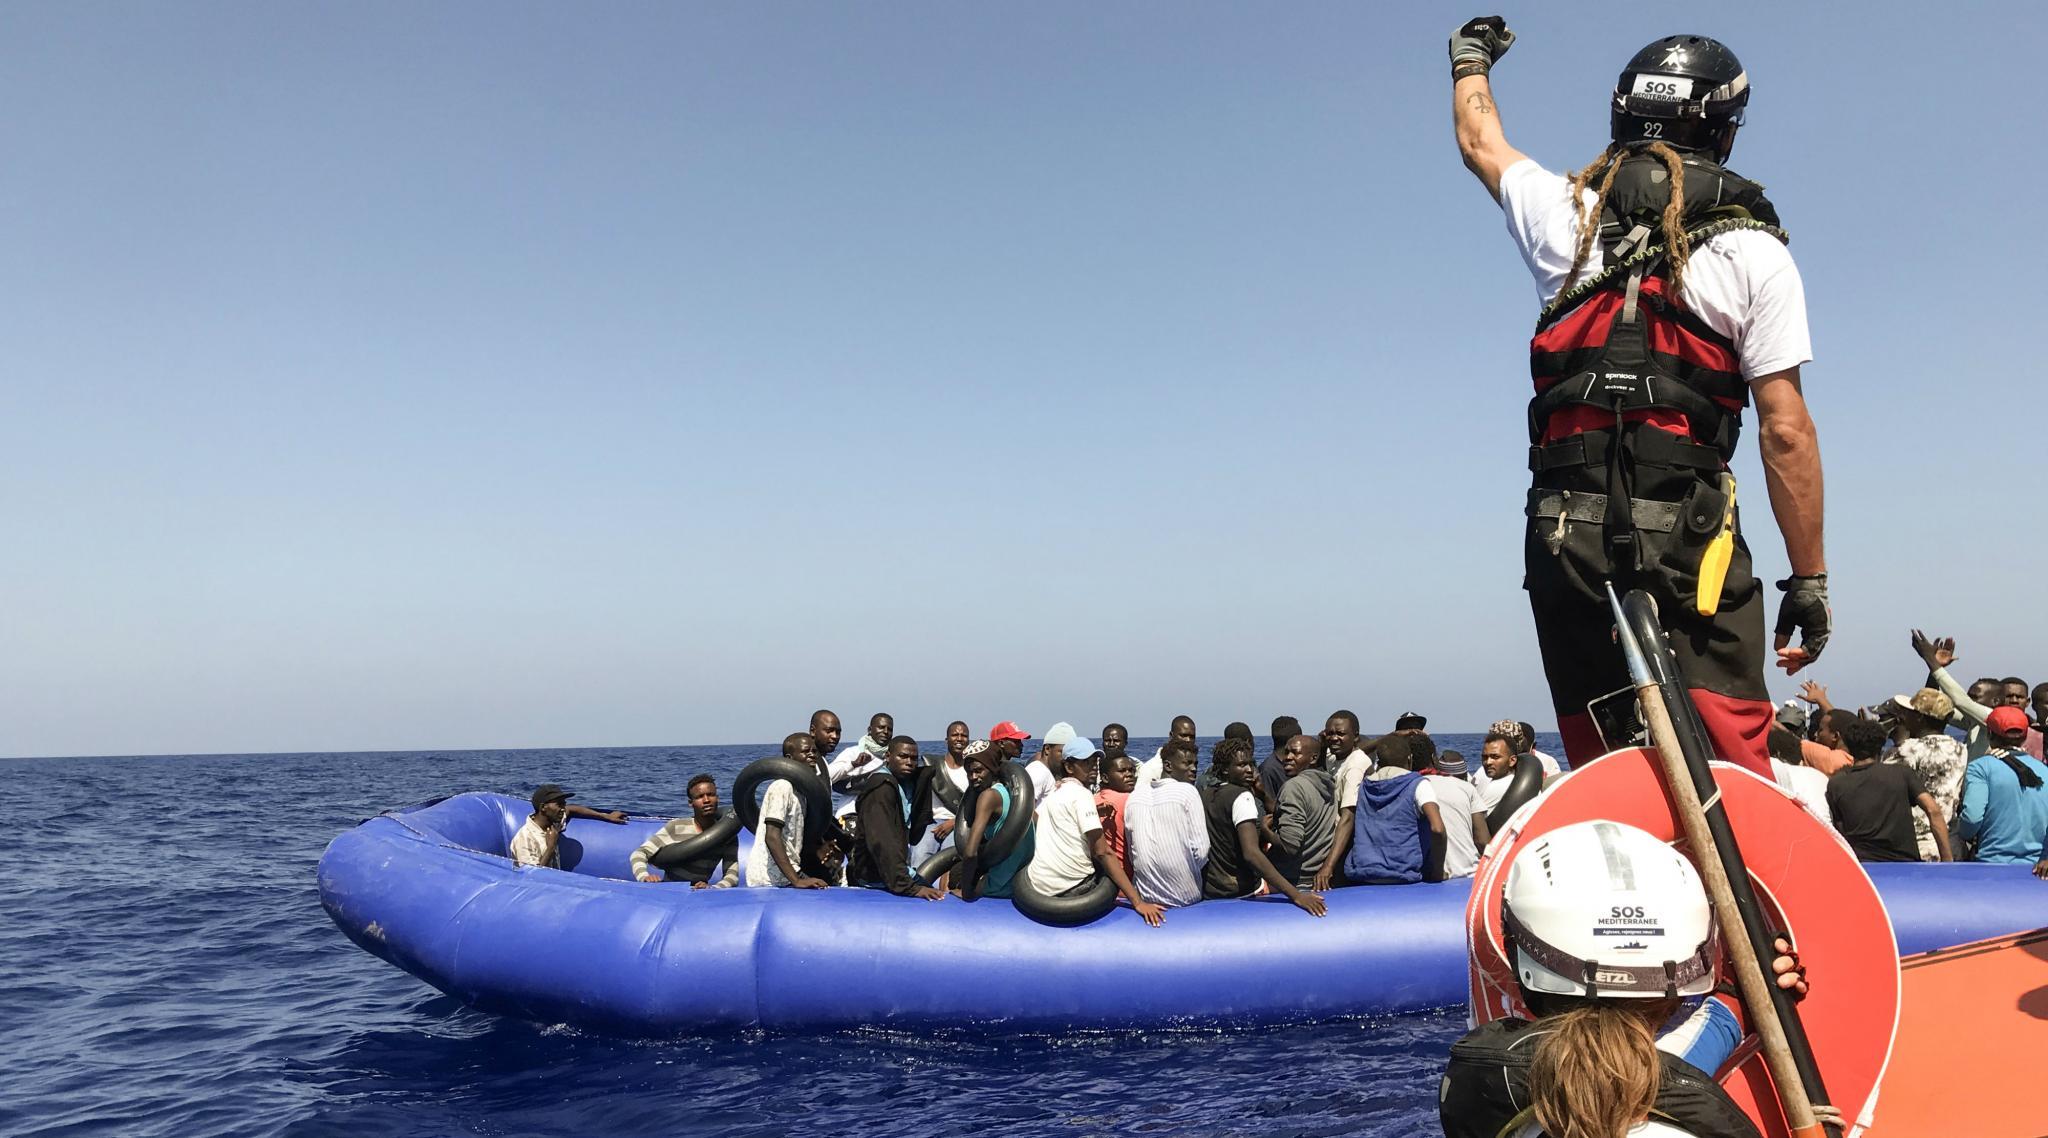 Spain's Coastguard Saves 200 Migrants Crossing Mediterranean Sea on Christmas Day